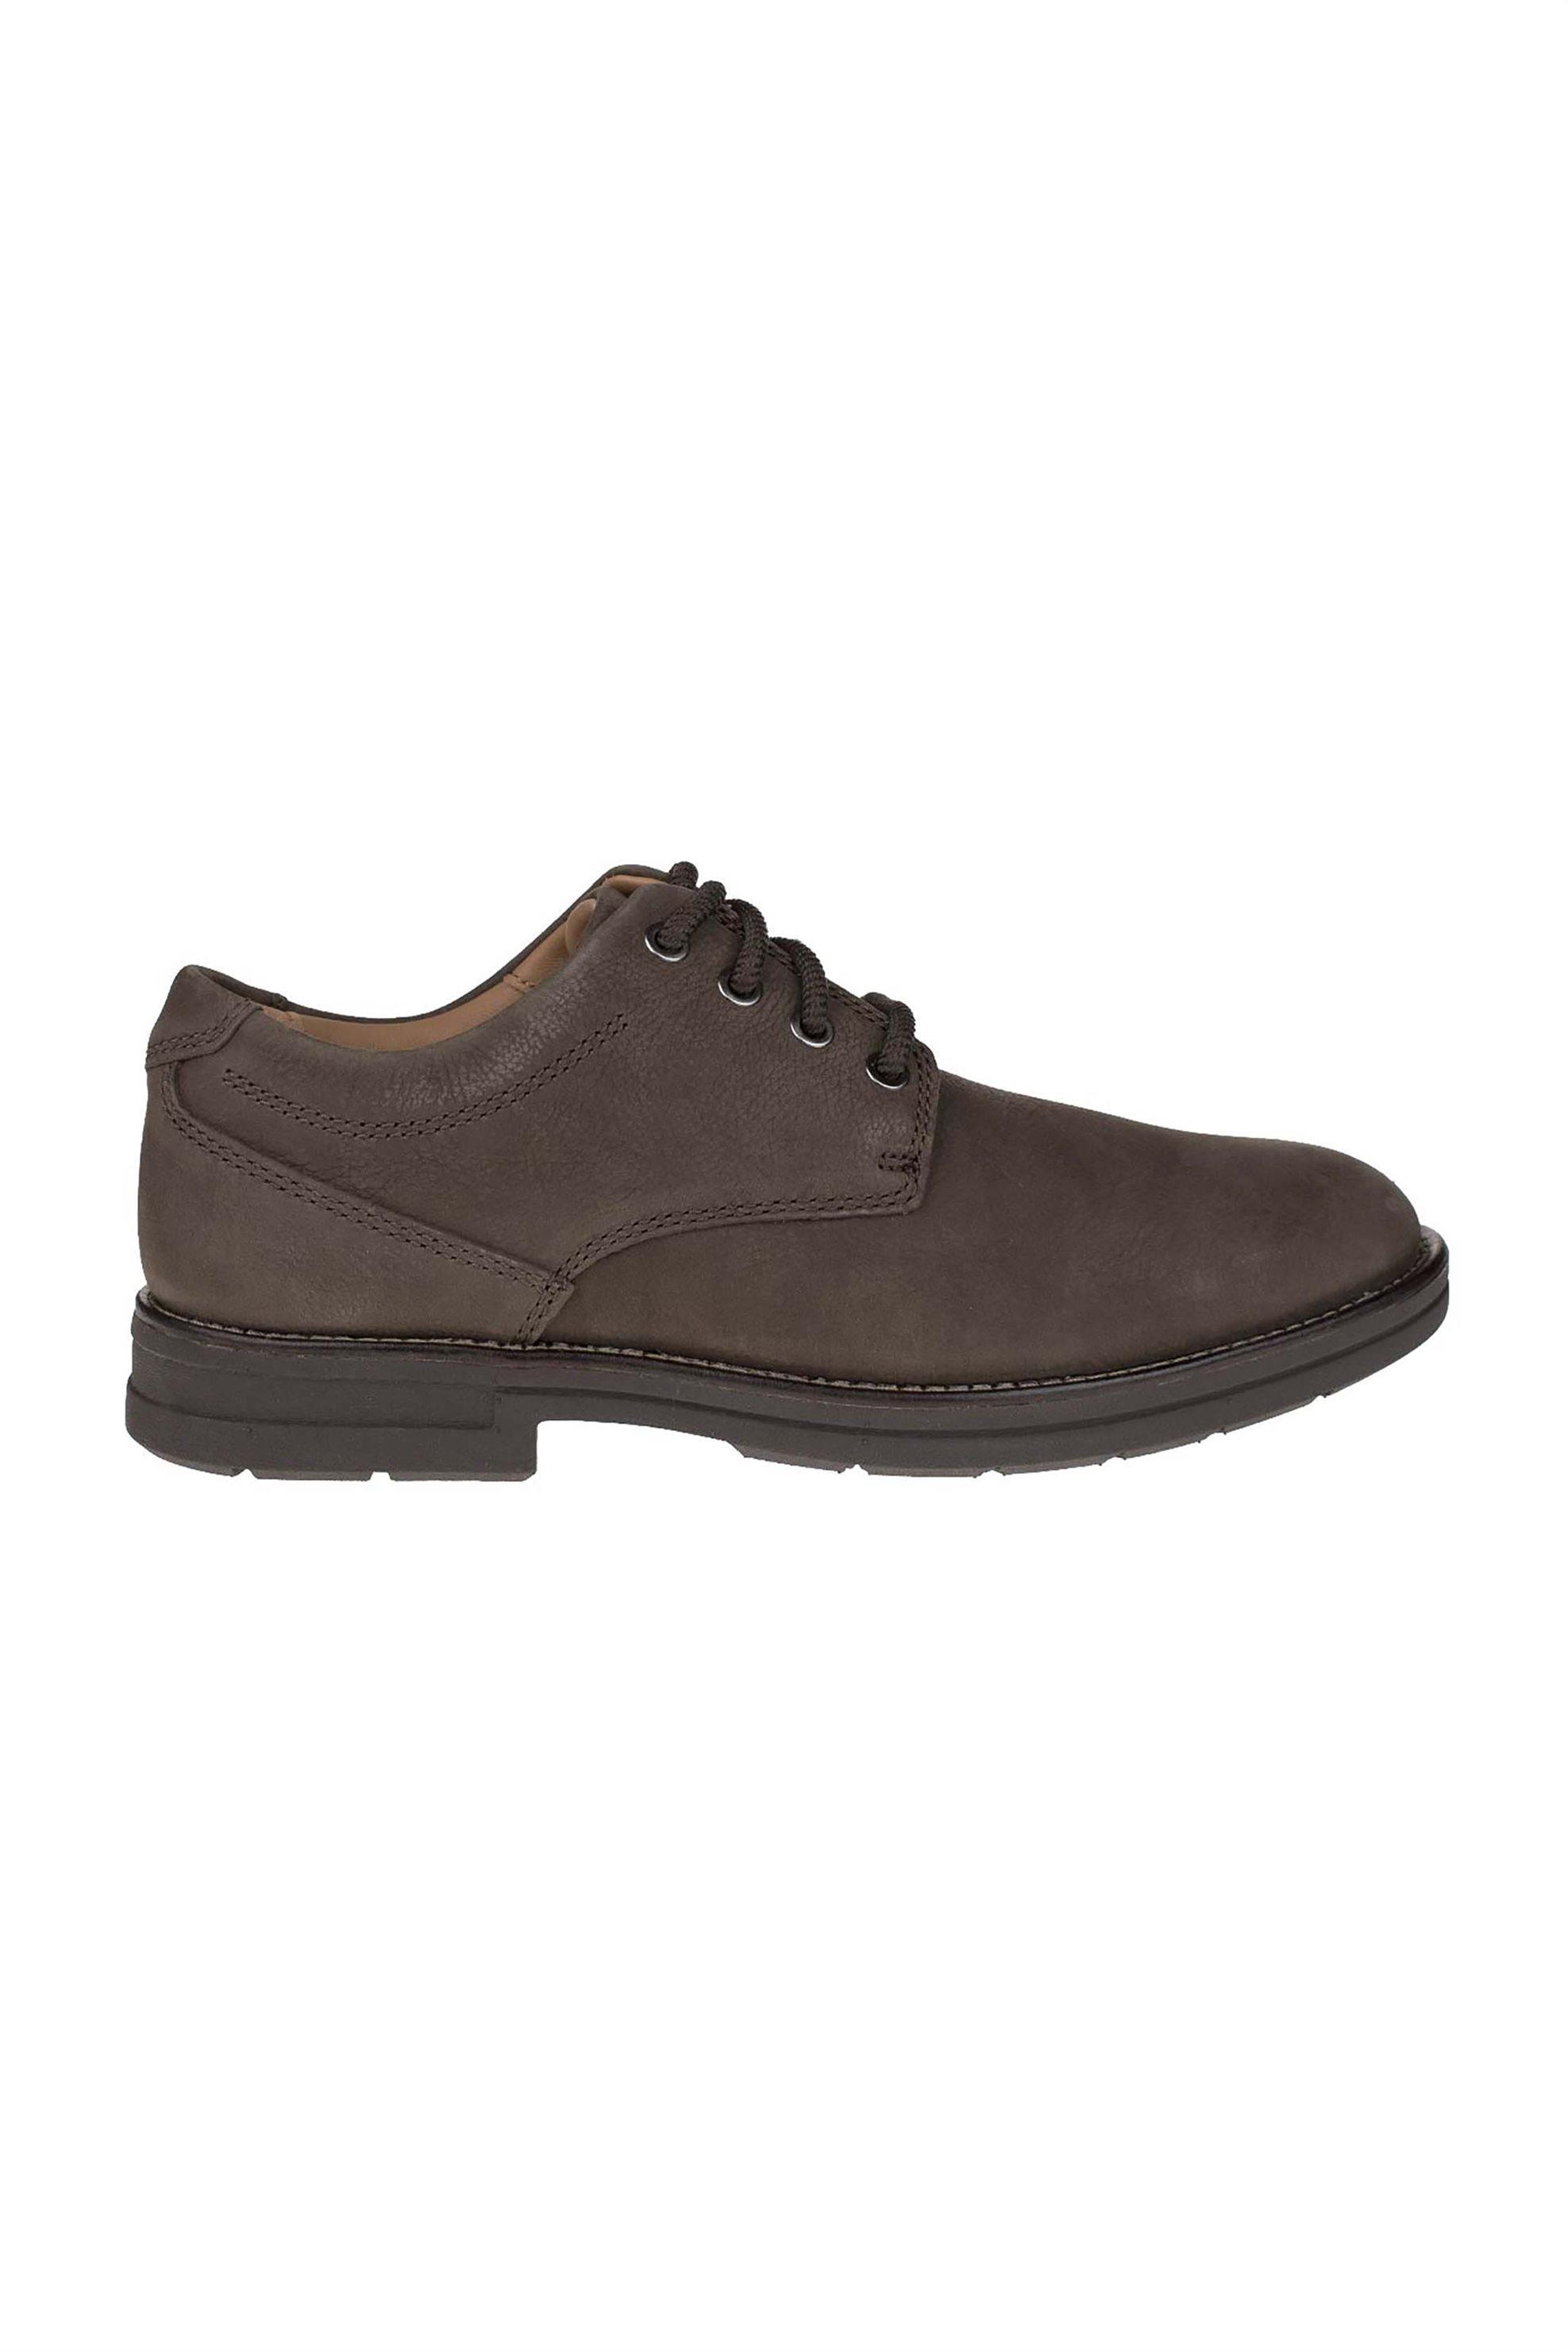 "Clarks ανδρικά nubuck παπούτσια με κορδόνια ""Banning Plain"" – 26152027 – Καφέ"